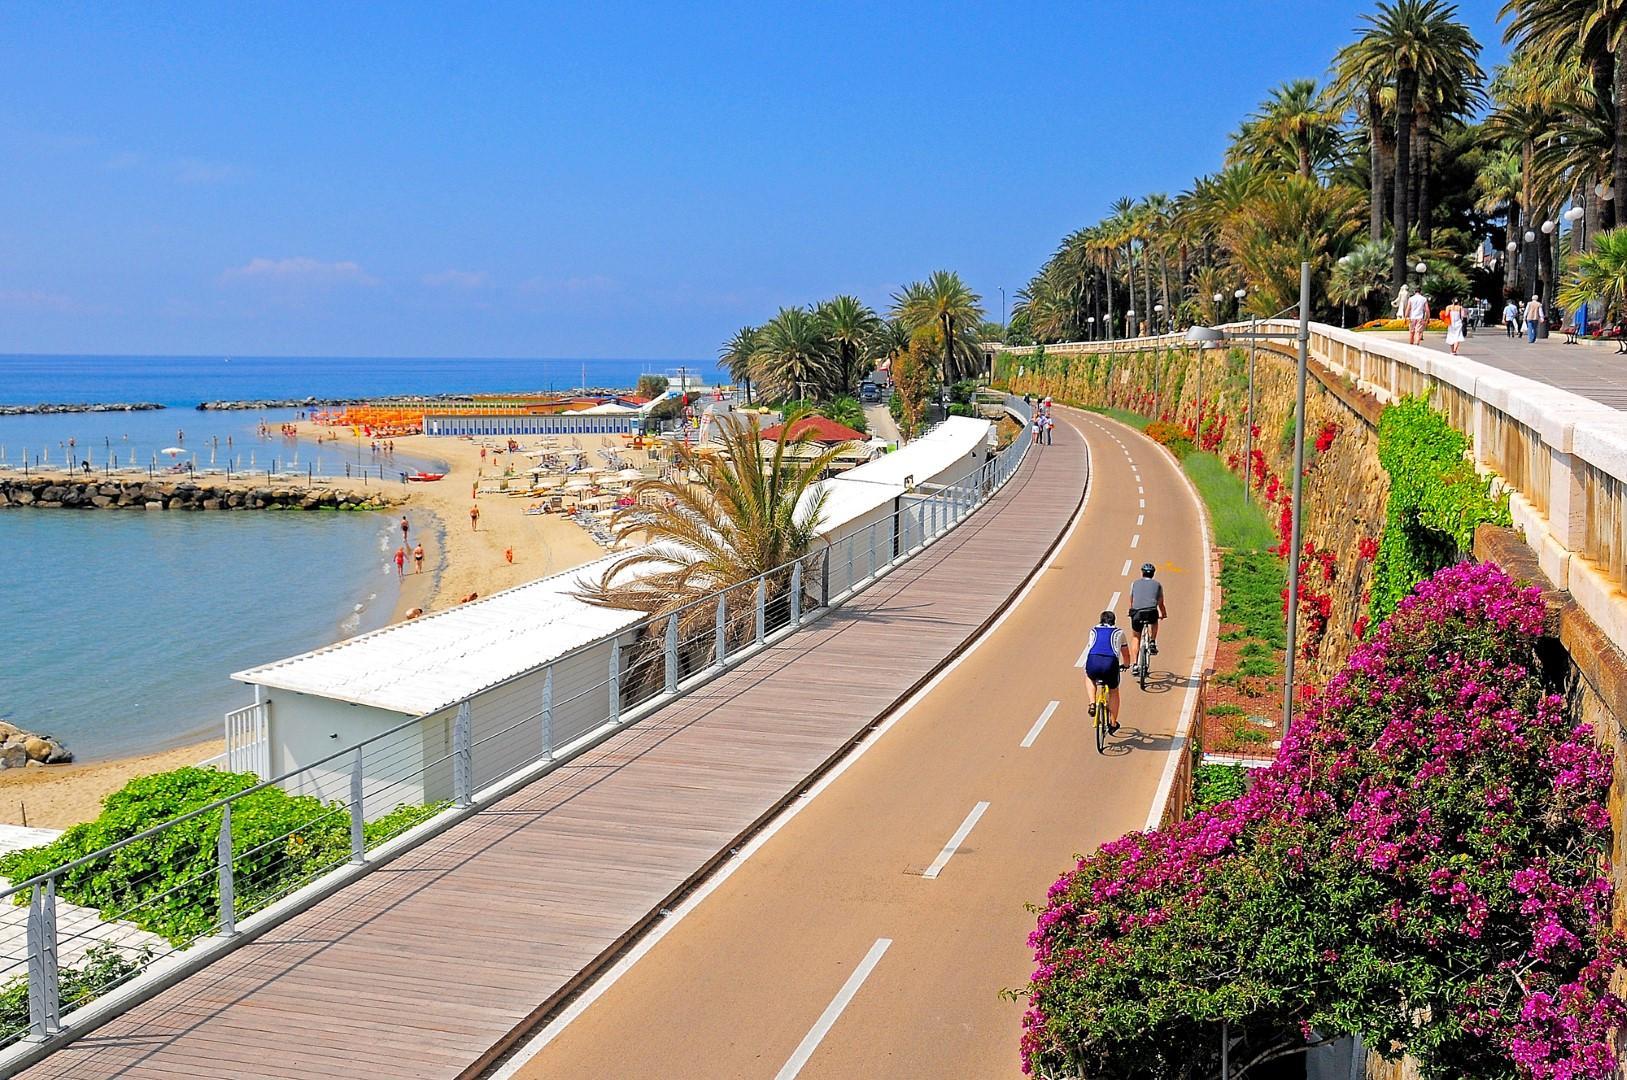 Vacanze slow: in bici per scoprire la Liguria